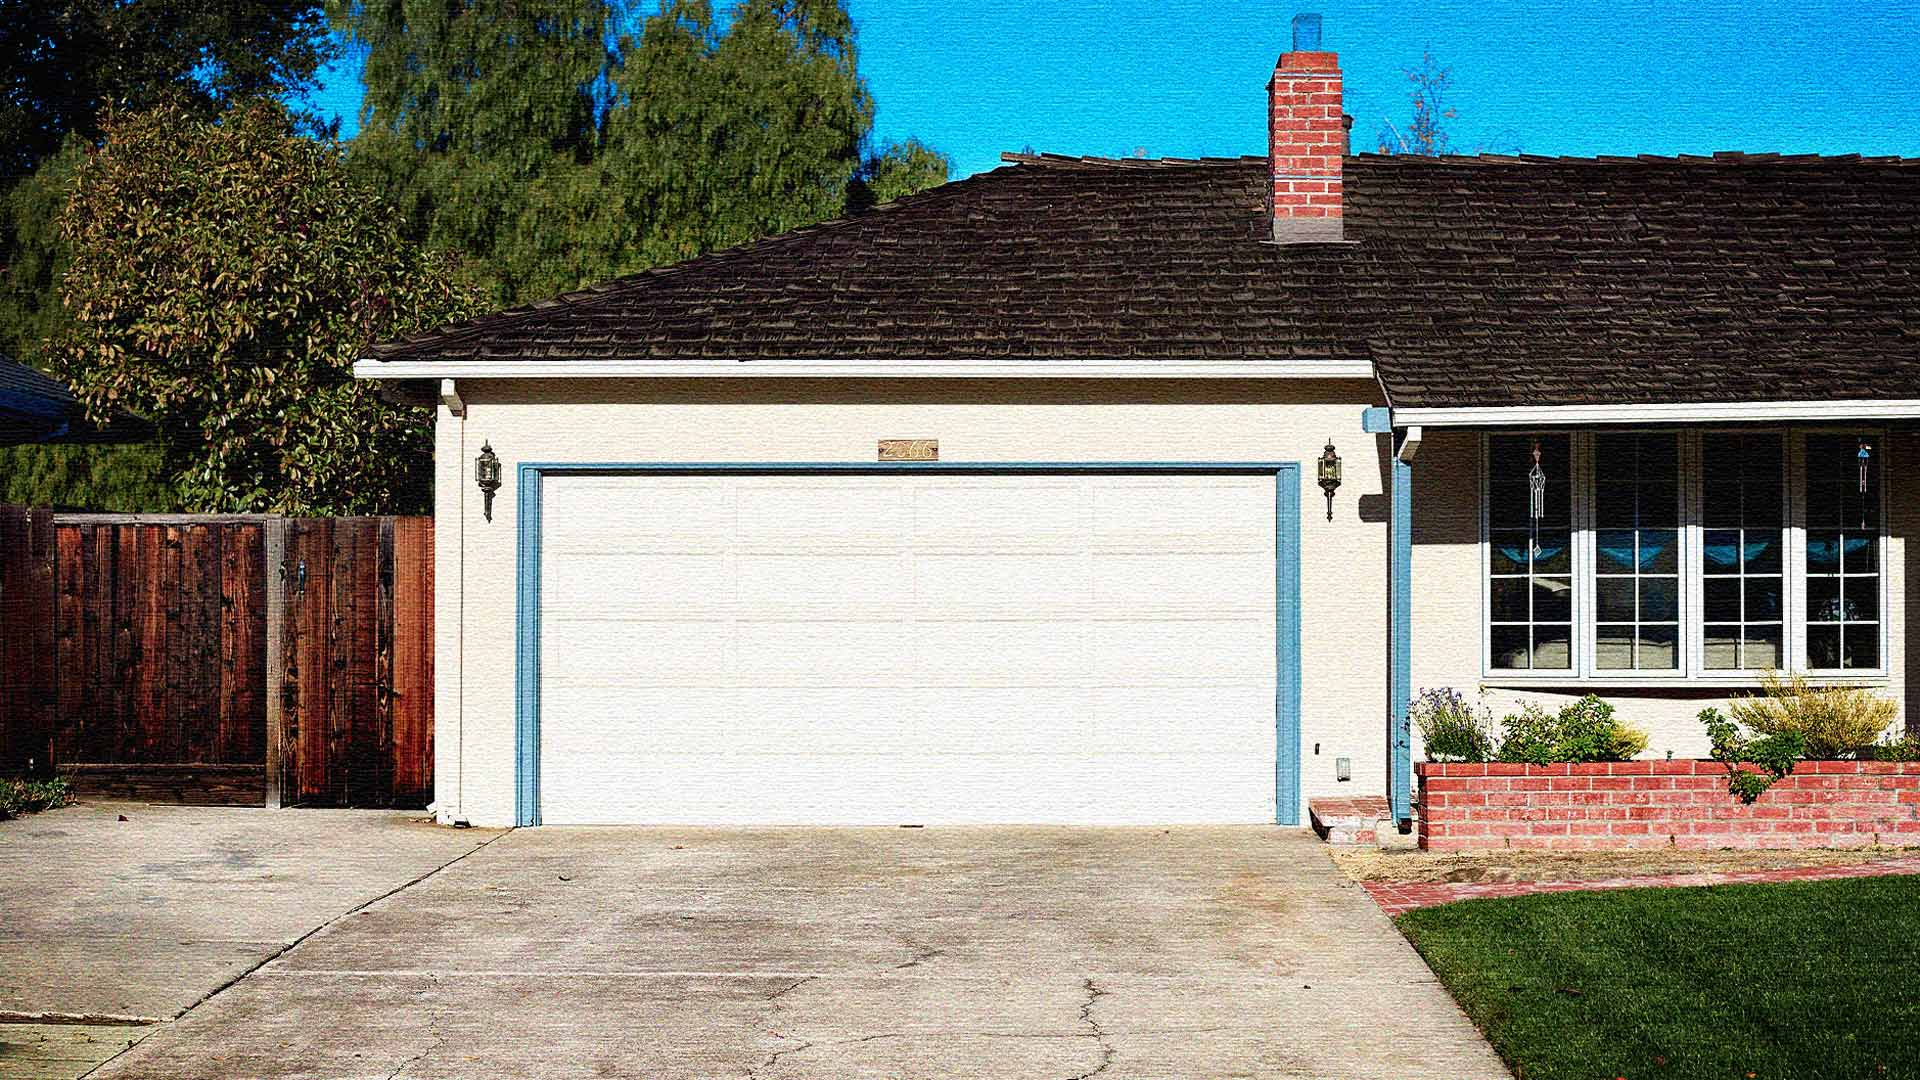 Steve Jobs' Garage